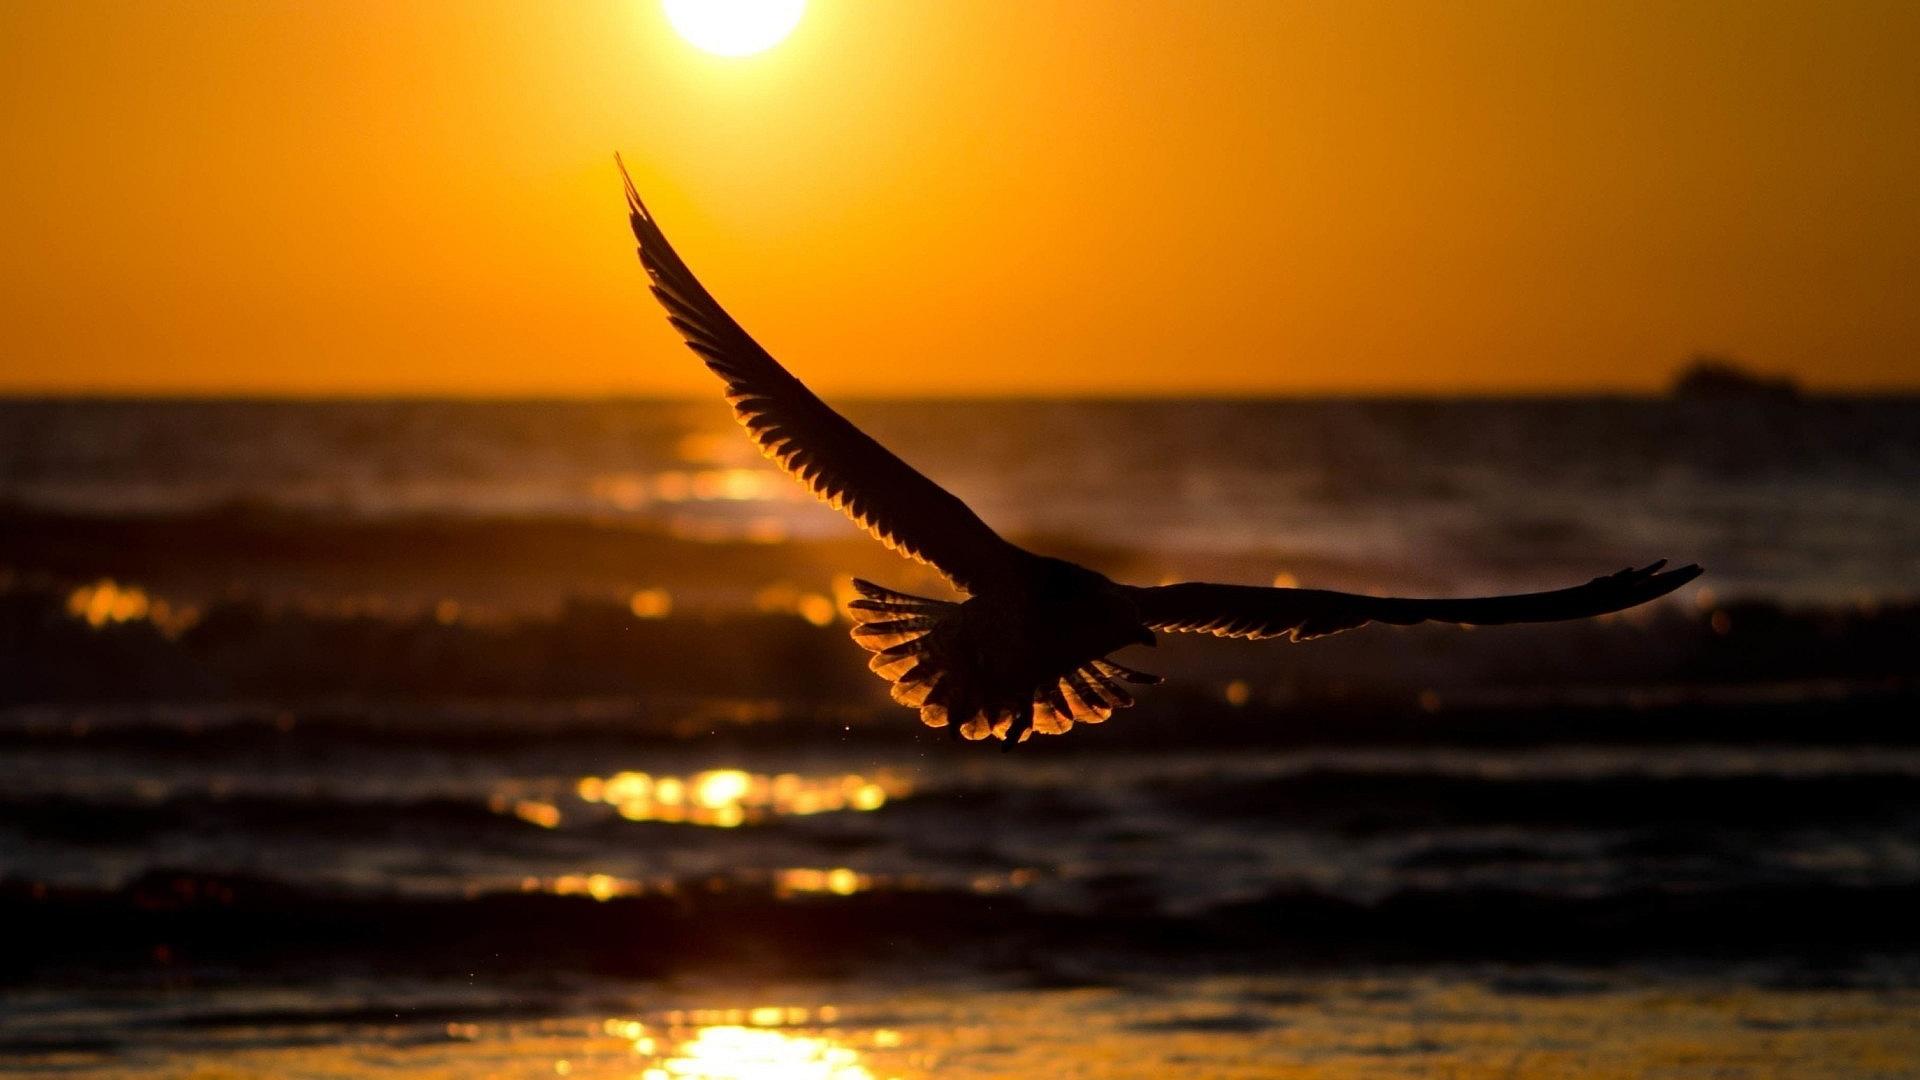 ... Flying Birds HD Wallpapers bird 7 bird 8 bird 9 ...